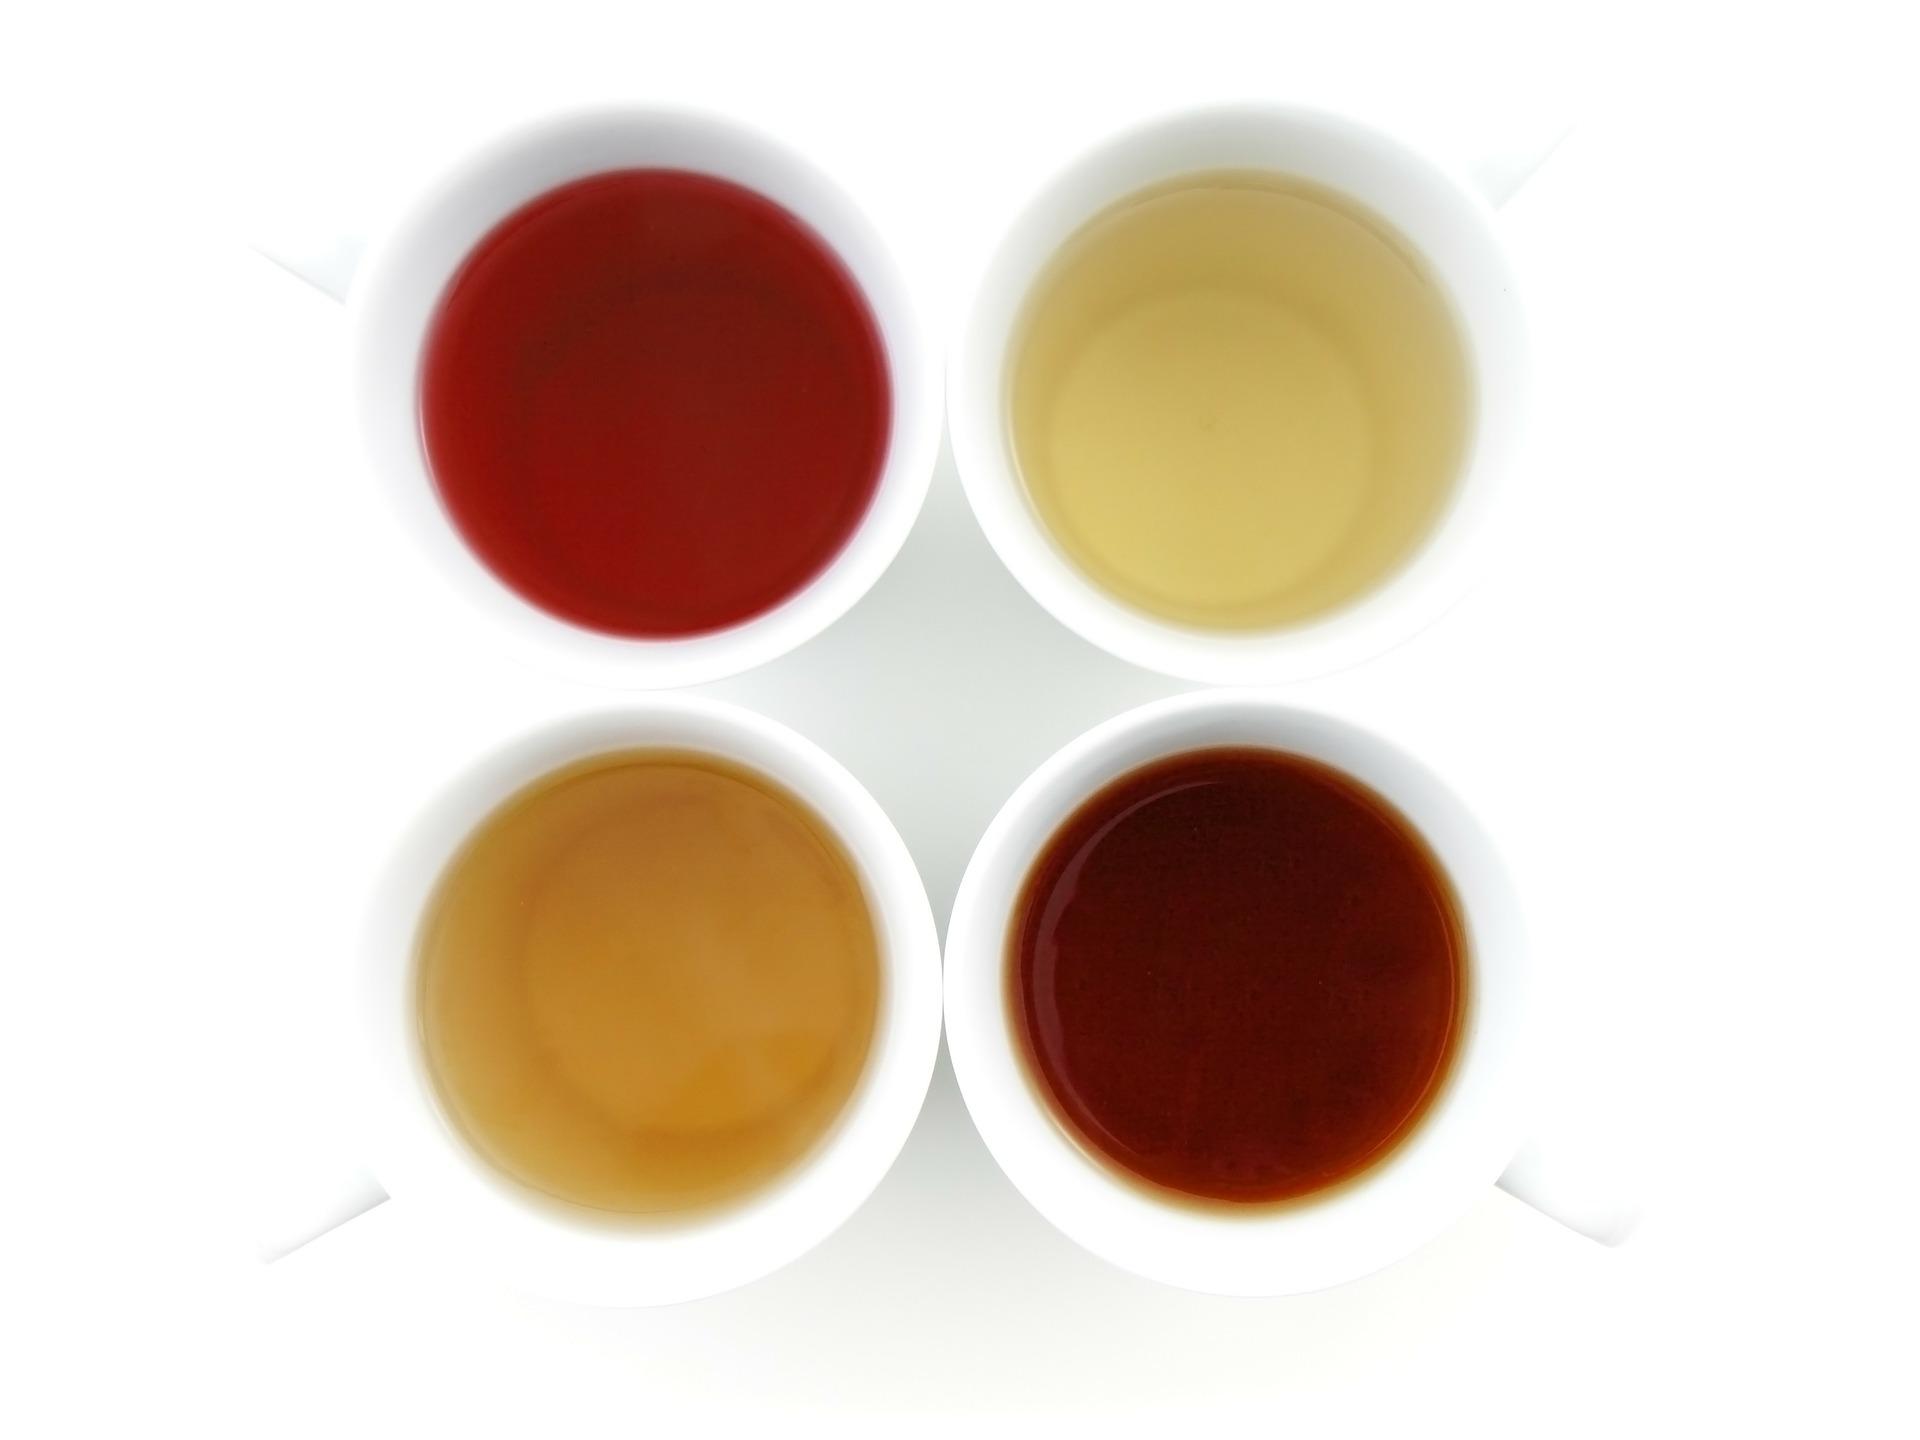 4 Types of Tea